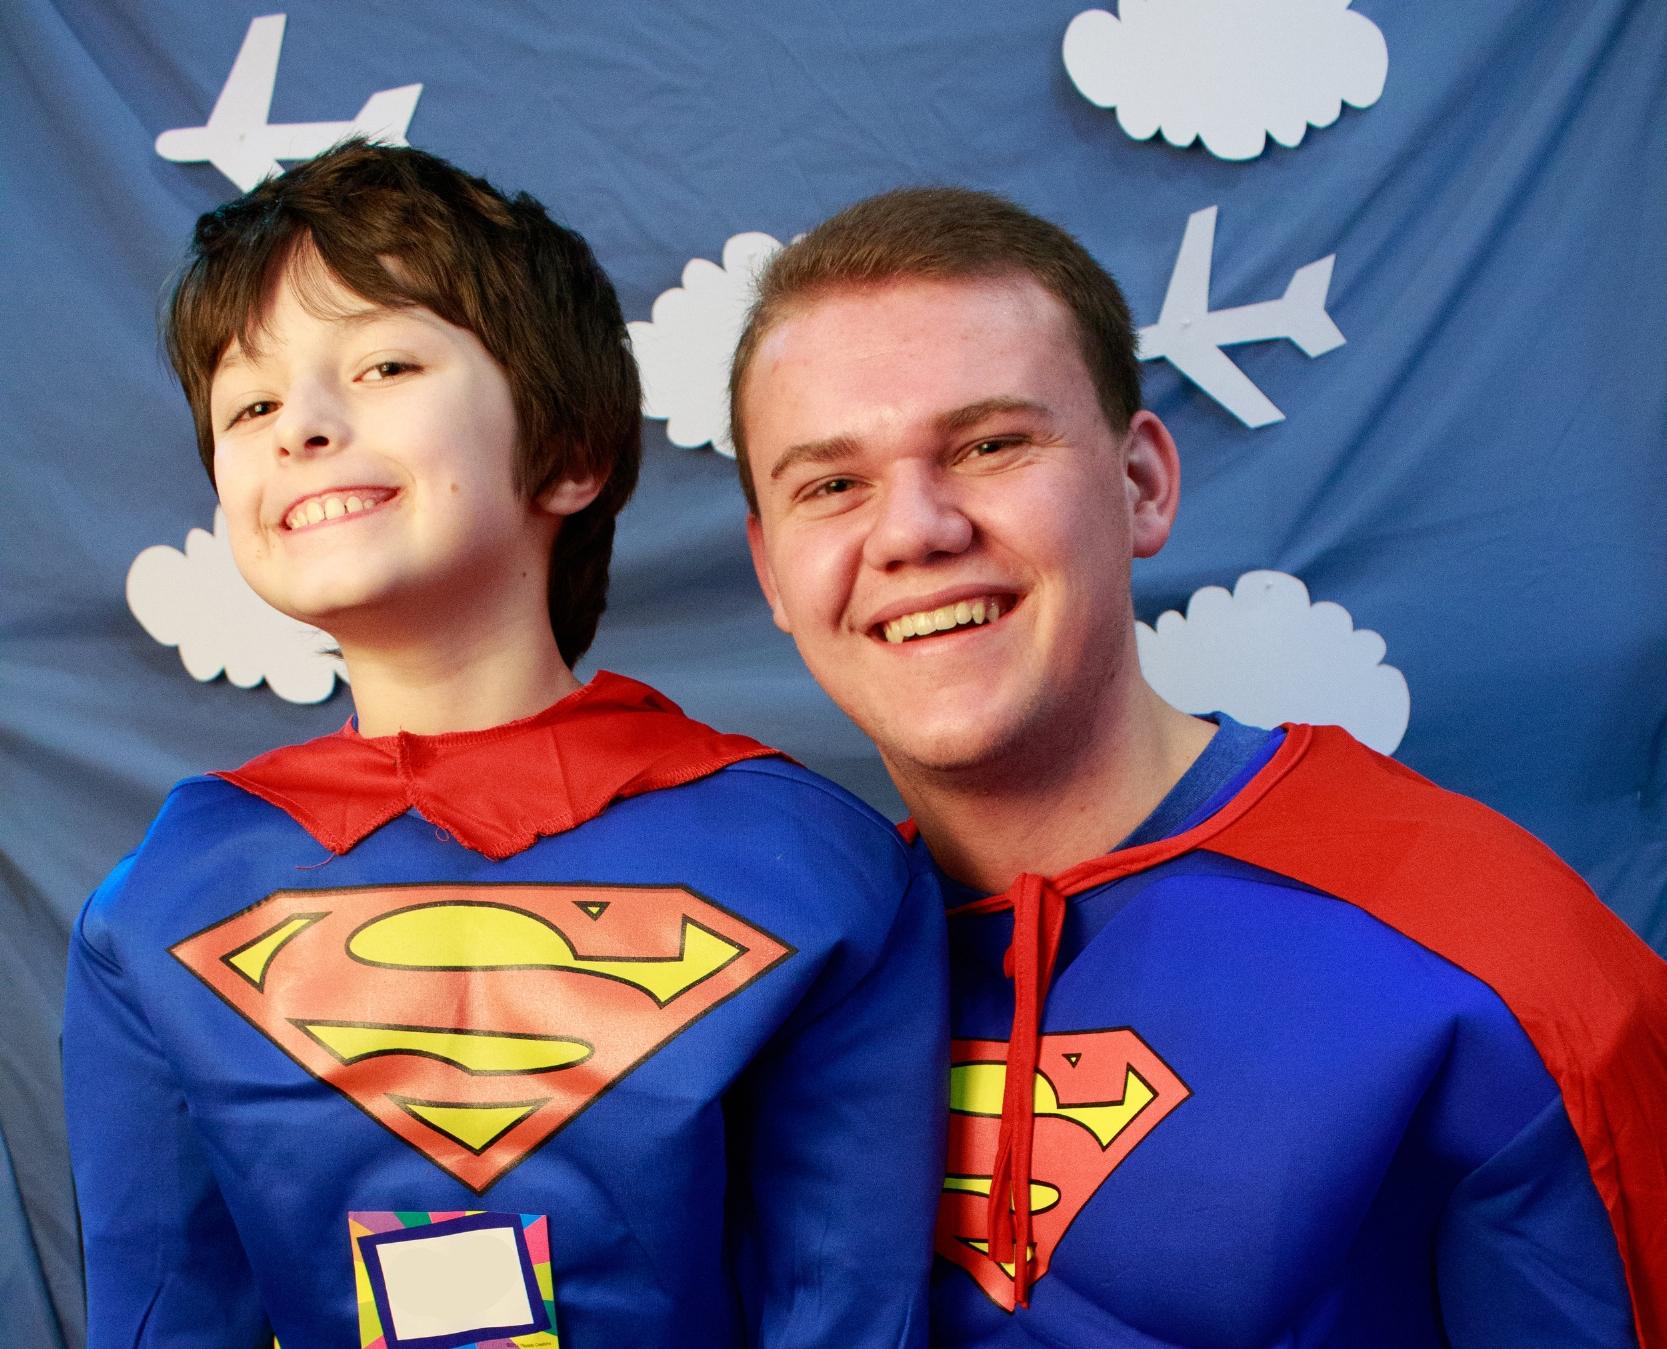 Super boys.jpg